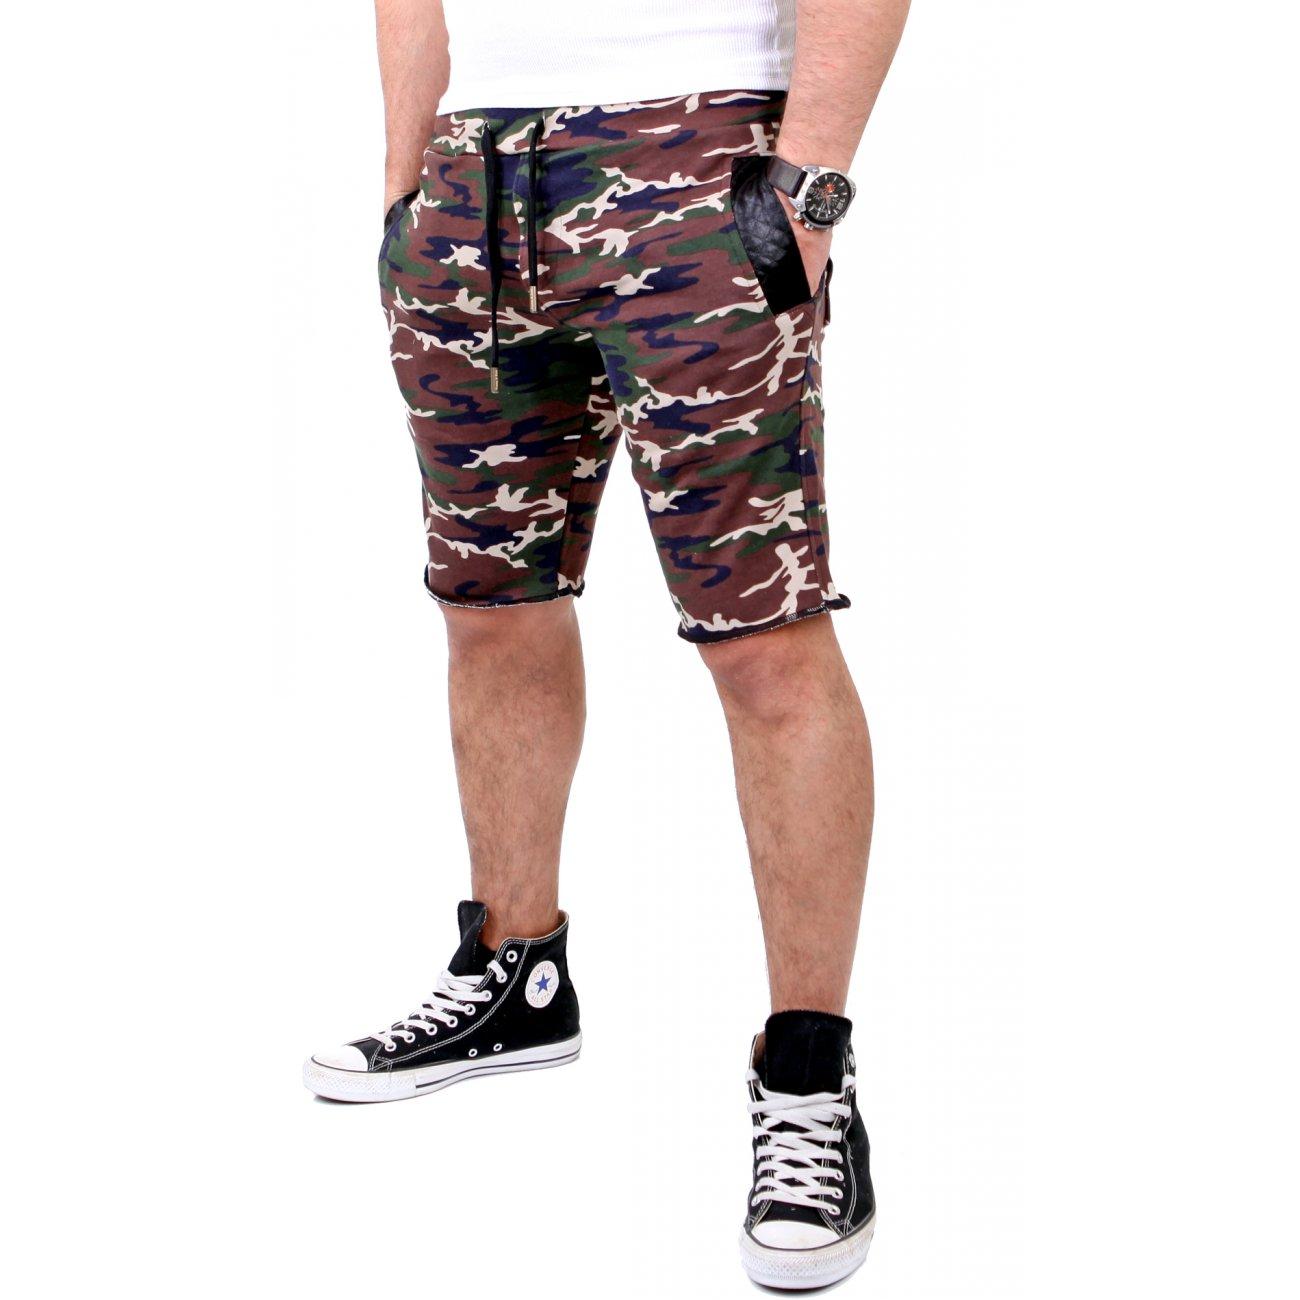 shorts herren camouflage reslad bermuda sweatpants kaufen. Black Bedroom Furniture Sets. Home Design Ideas